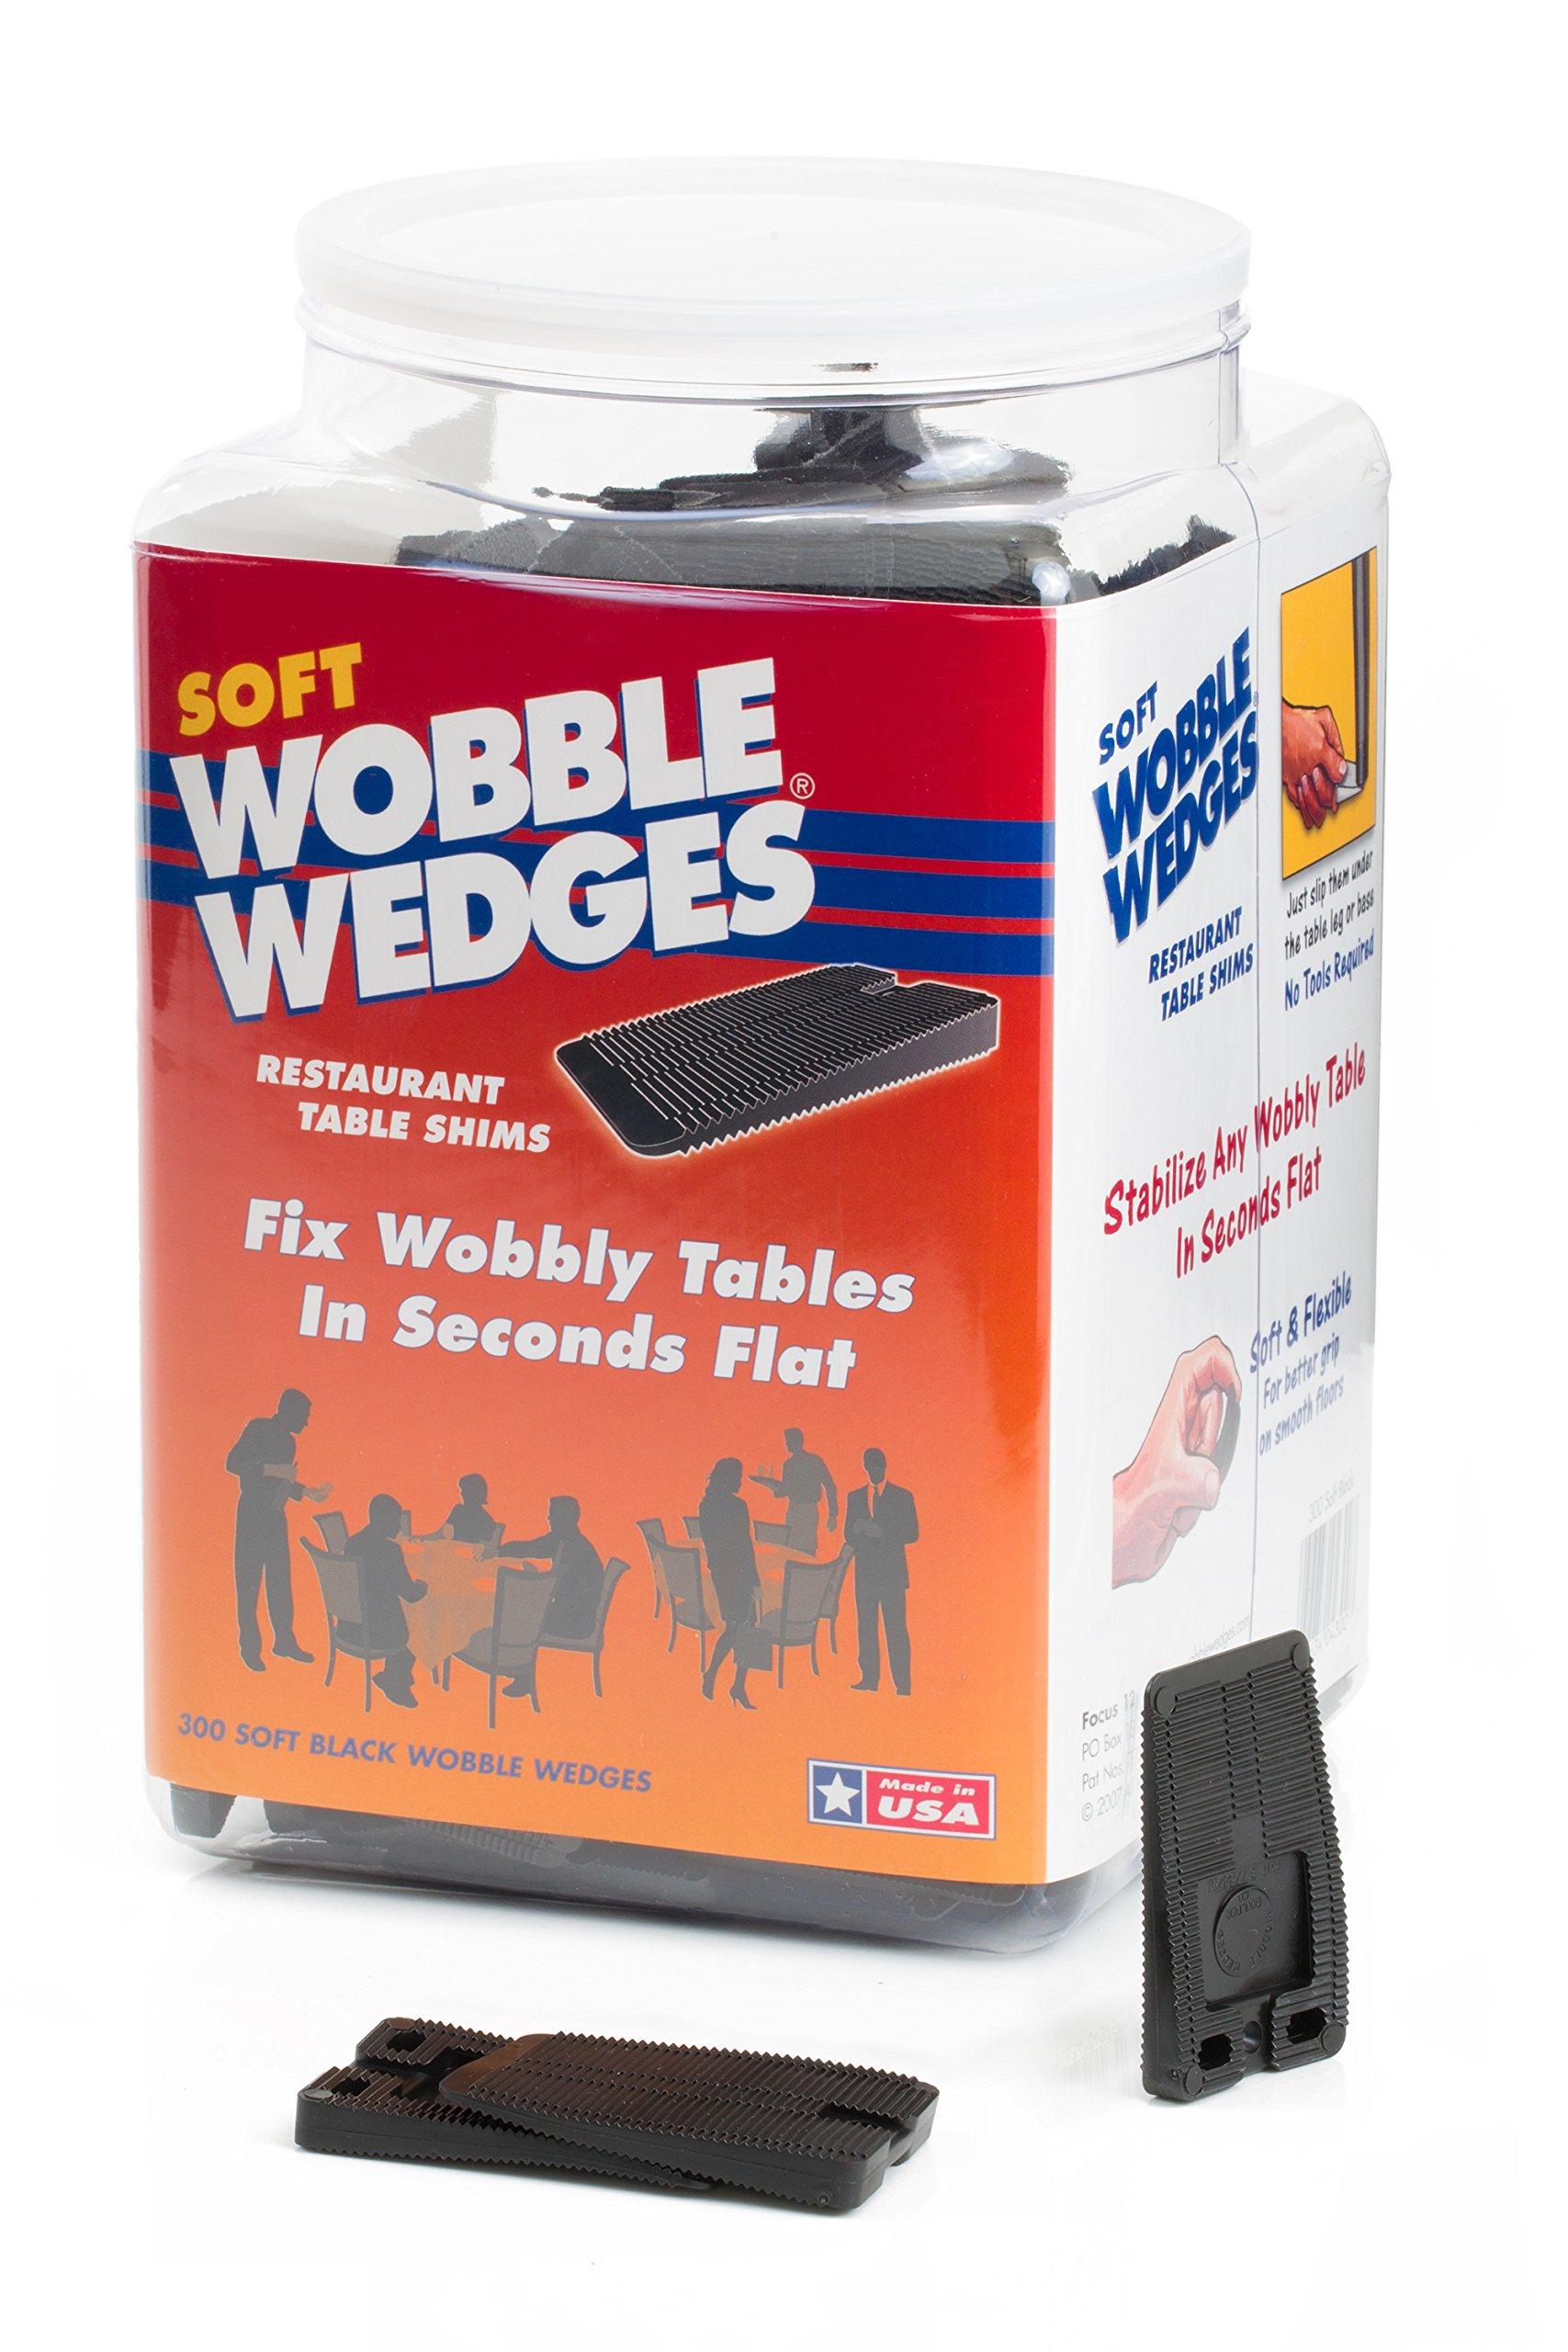 Wobble Wedge - Soft Black - Restaurant Table Shims - 300 Piece Jar by WOBBLE WEDGES